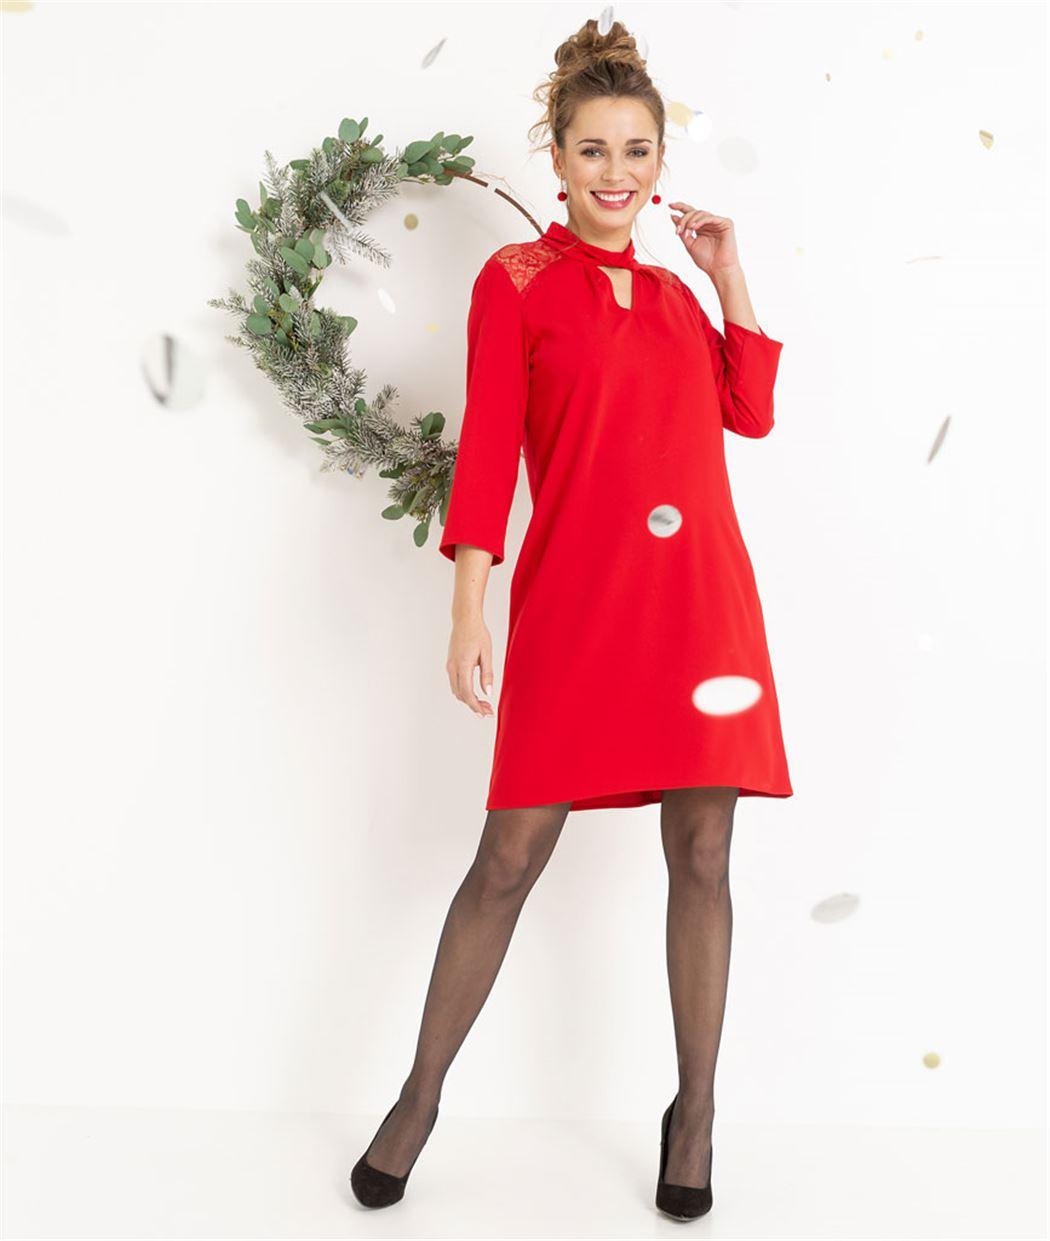 0a67ad01639dd Robe femme rouge habillée avec dentelle ROUGE - Grain de Malice